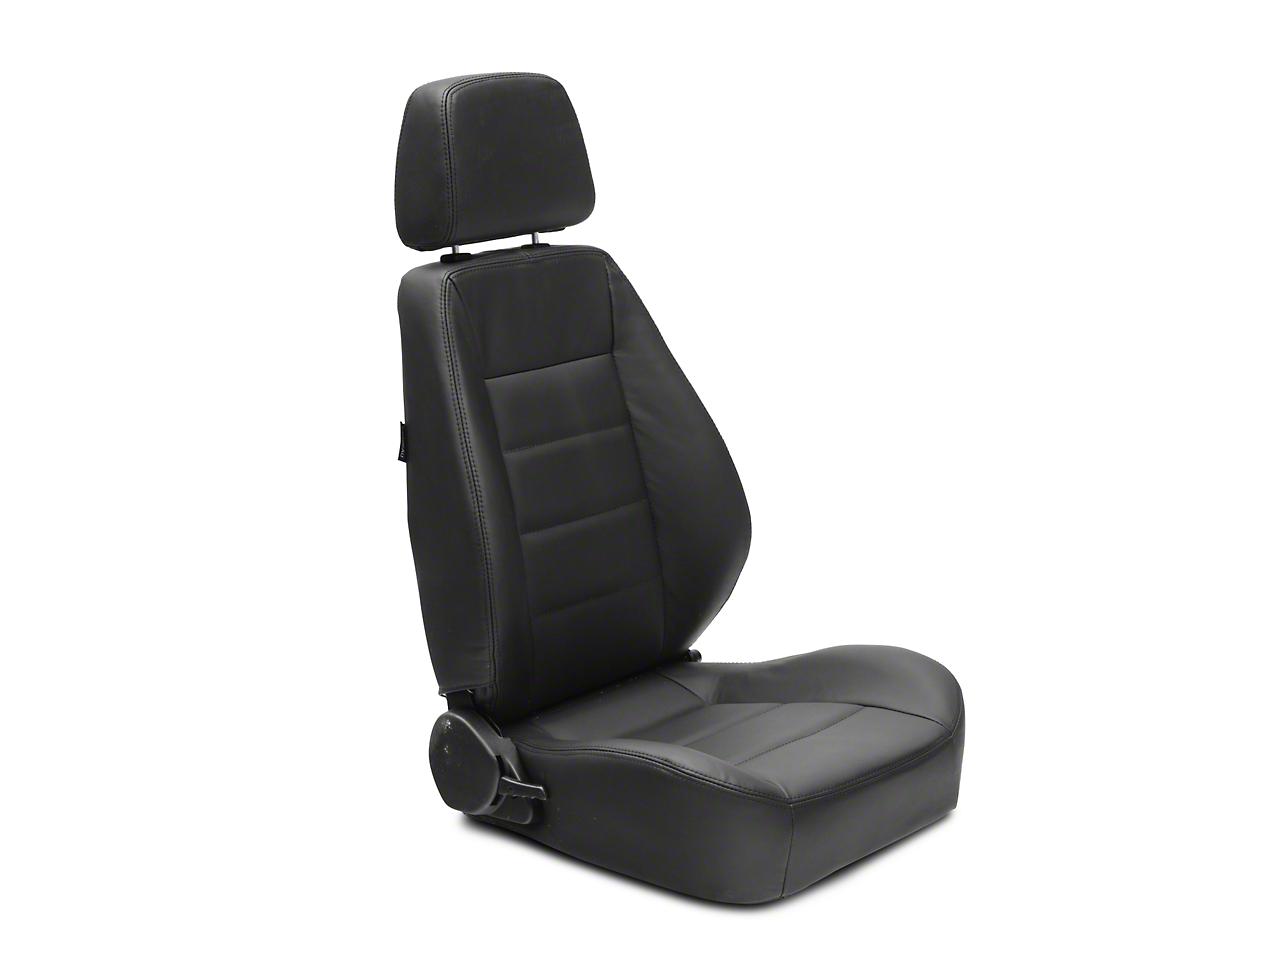 Corbeau Sport Reclining Seat - Black Leather - Pair (87-18 Wrangler YJ, TJ & JK; Seat Brackets are Required for TJ & JK Models)